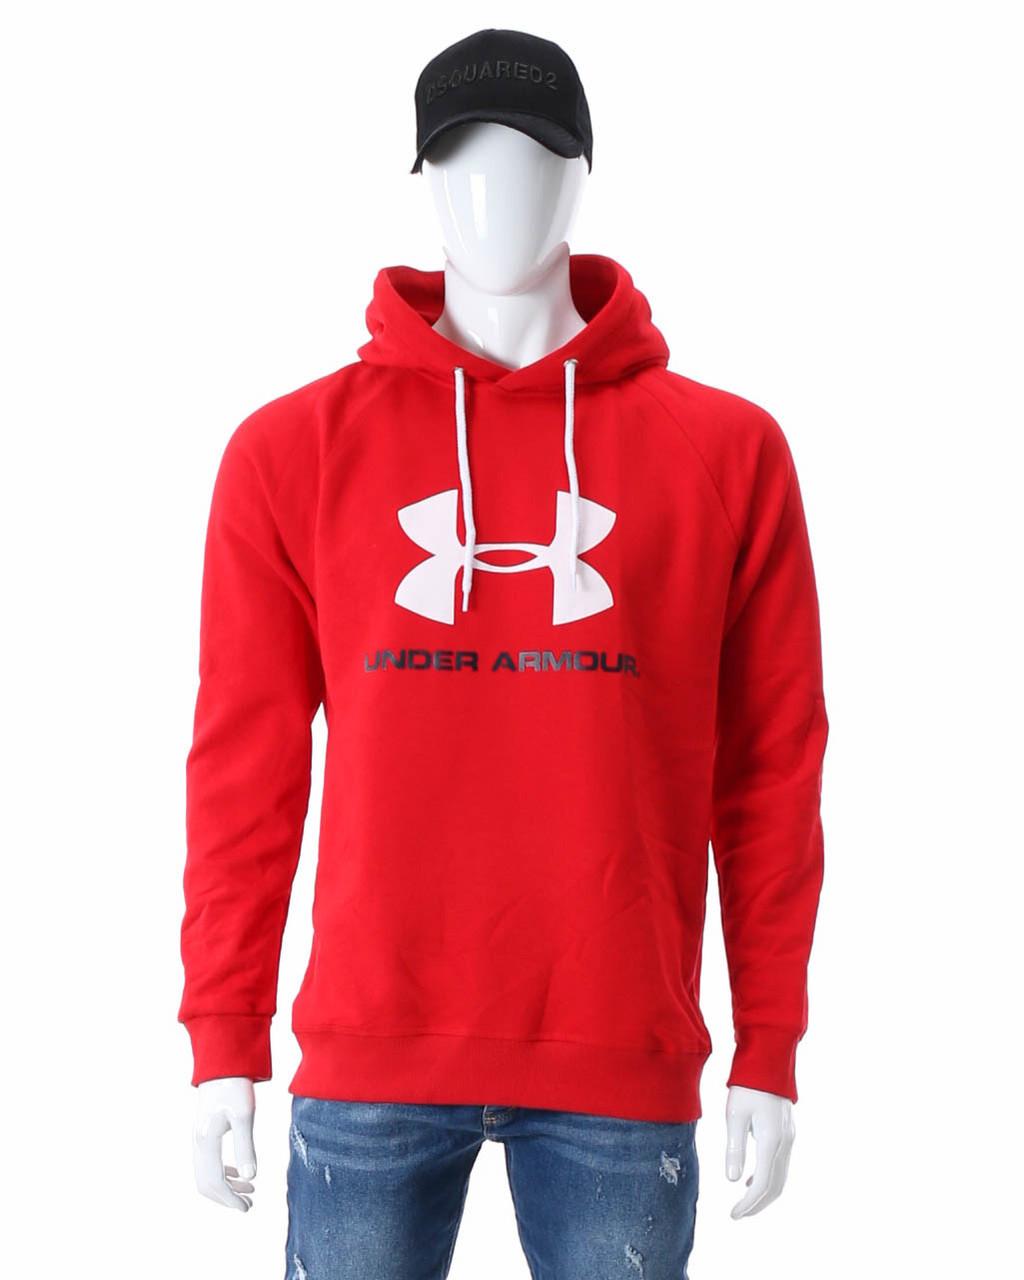 Худи осень-зима красный UNDER ARMOUR с лого Р-5 RED XXL(Р) 20-474-503